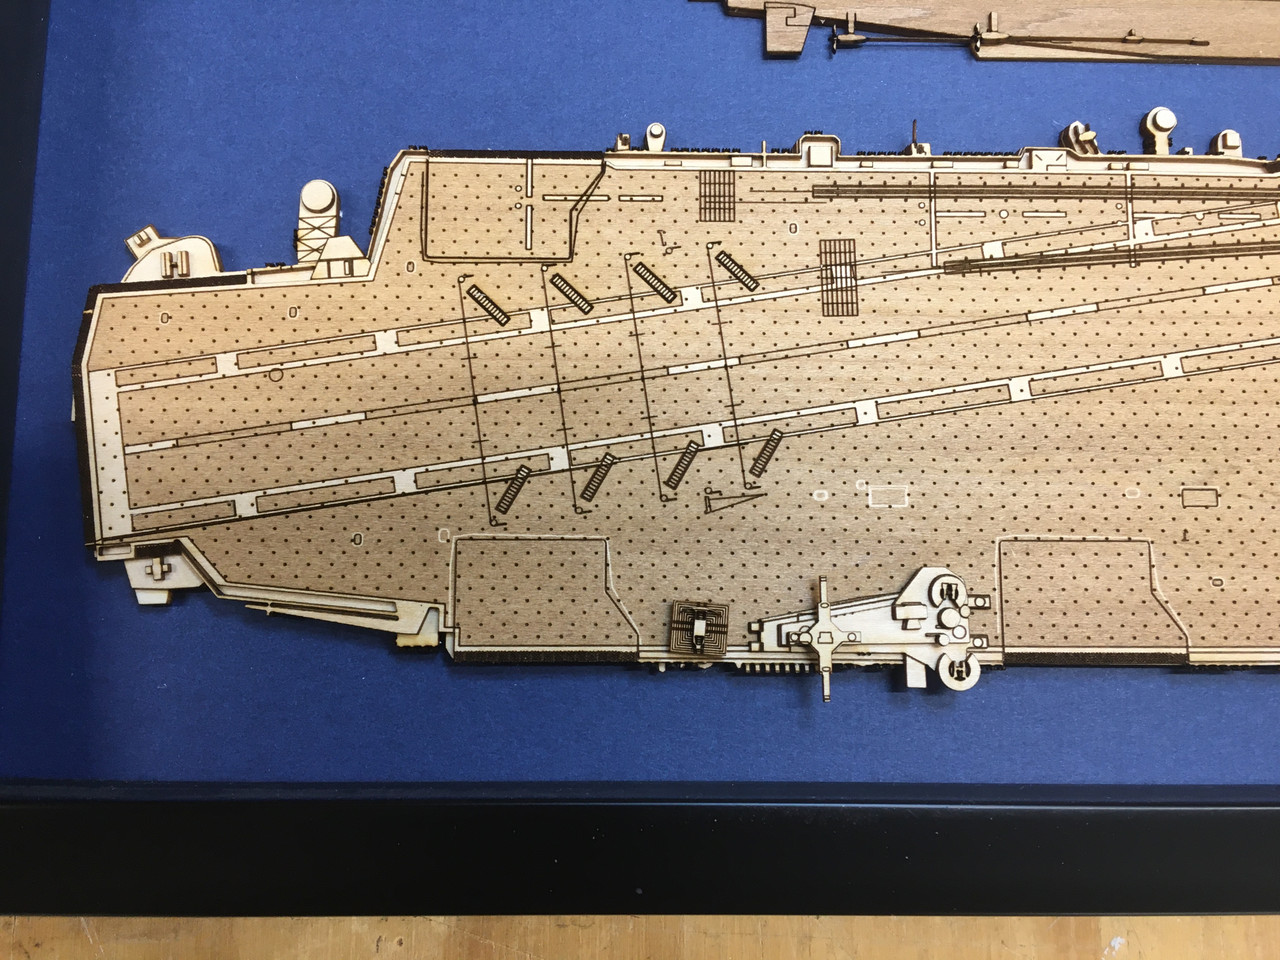 USS George Washington CVN-73 Wood Model